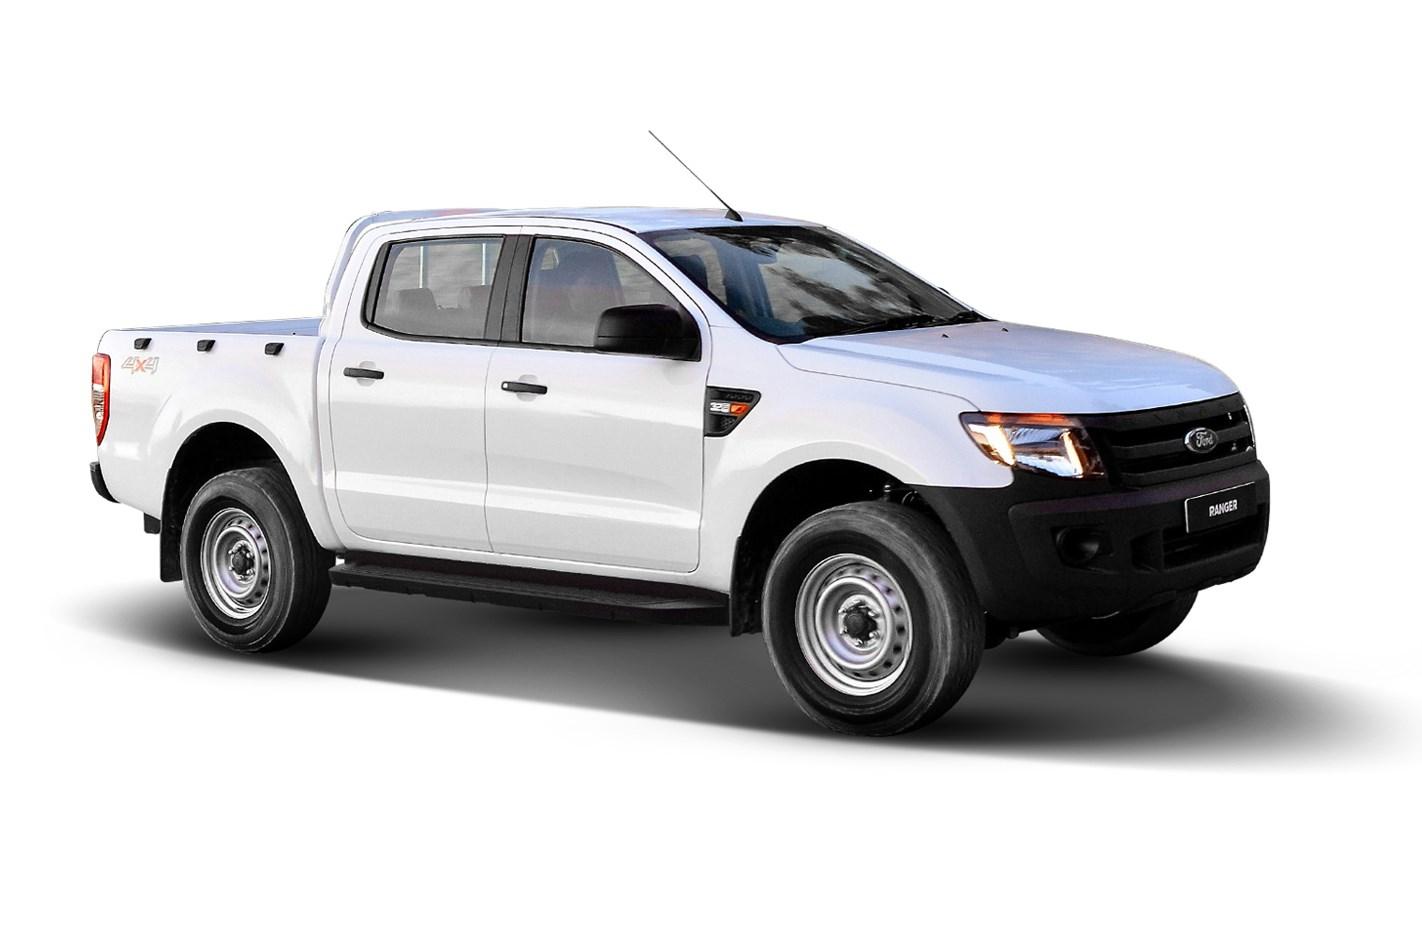 2017 ford ranger xls 3 2 4x4 3 2l 5cyl diesel turbocharged automatic ute